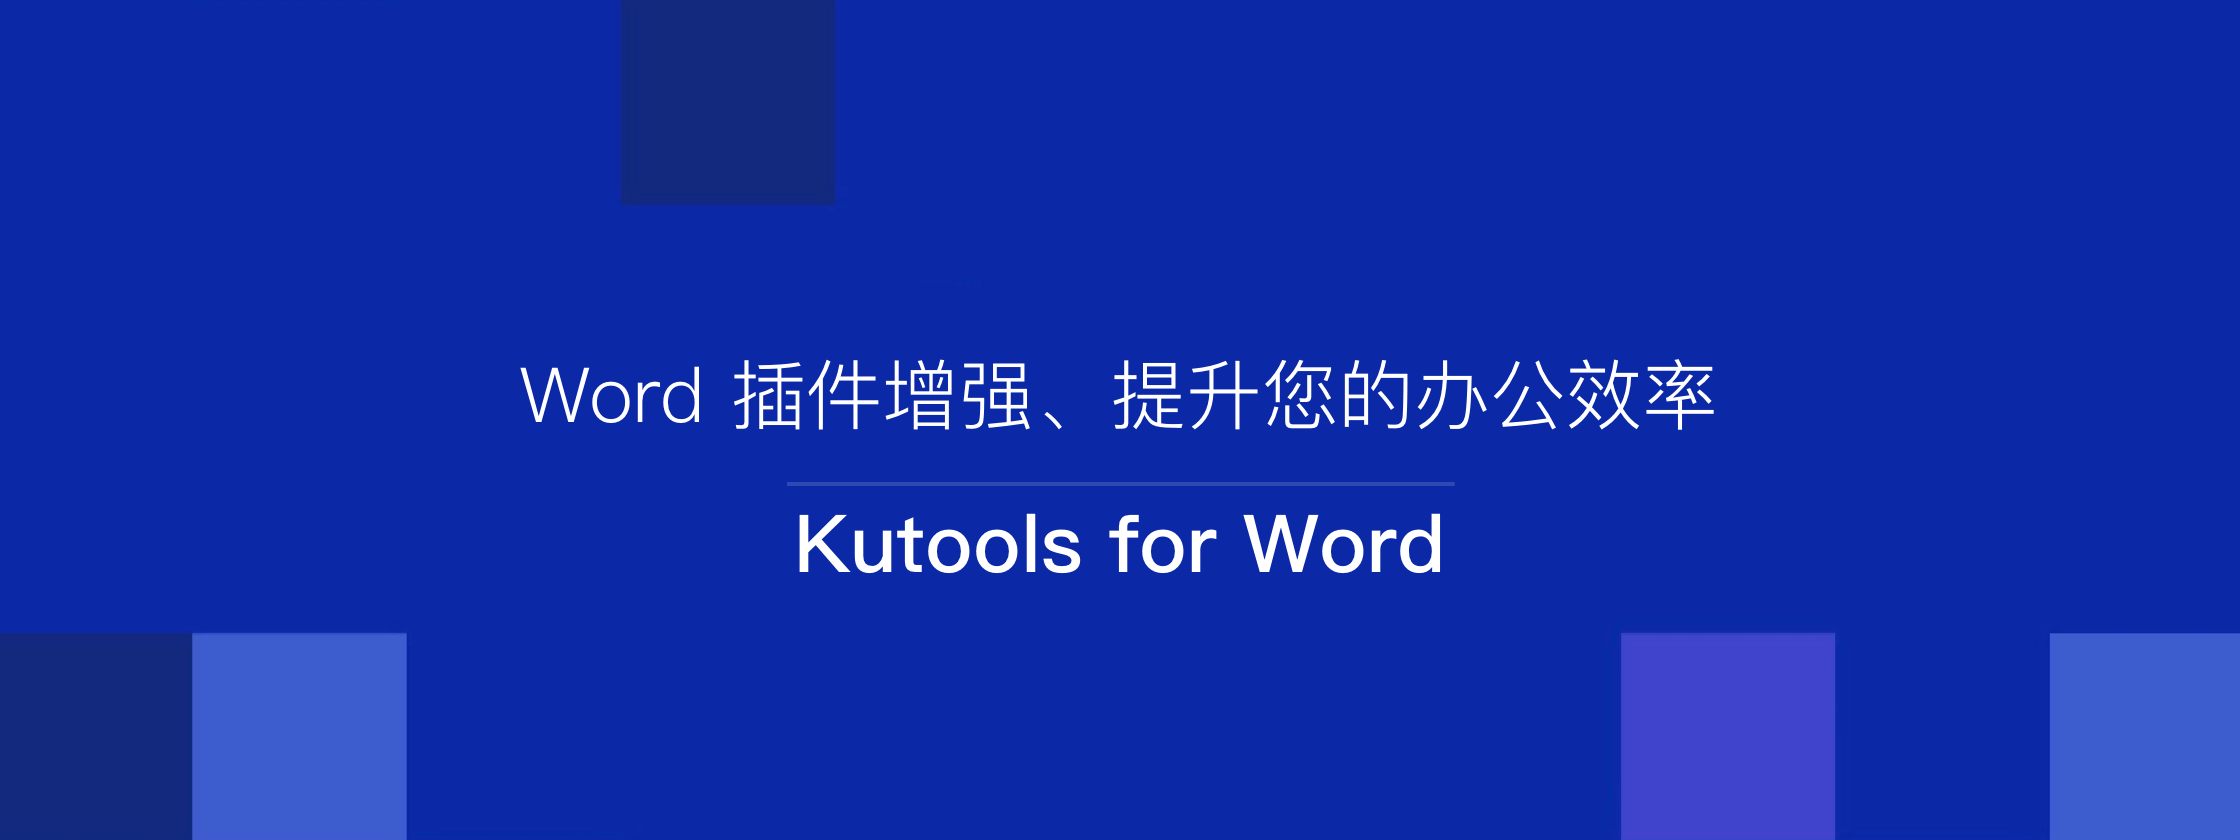 Kutools for Word – Word 插件增强、提升您的办公效率